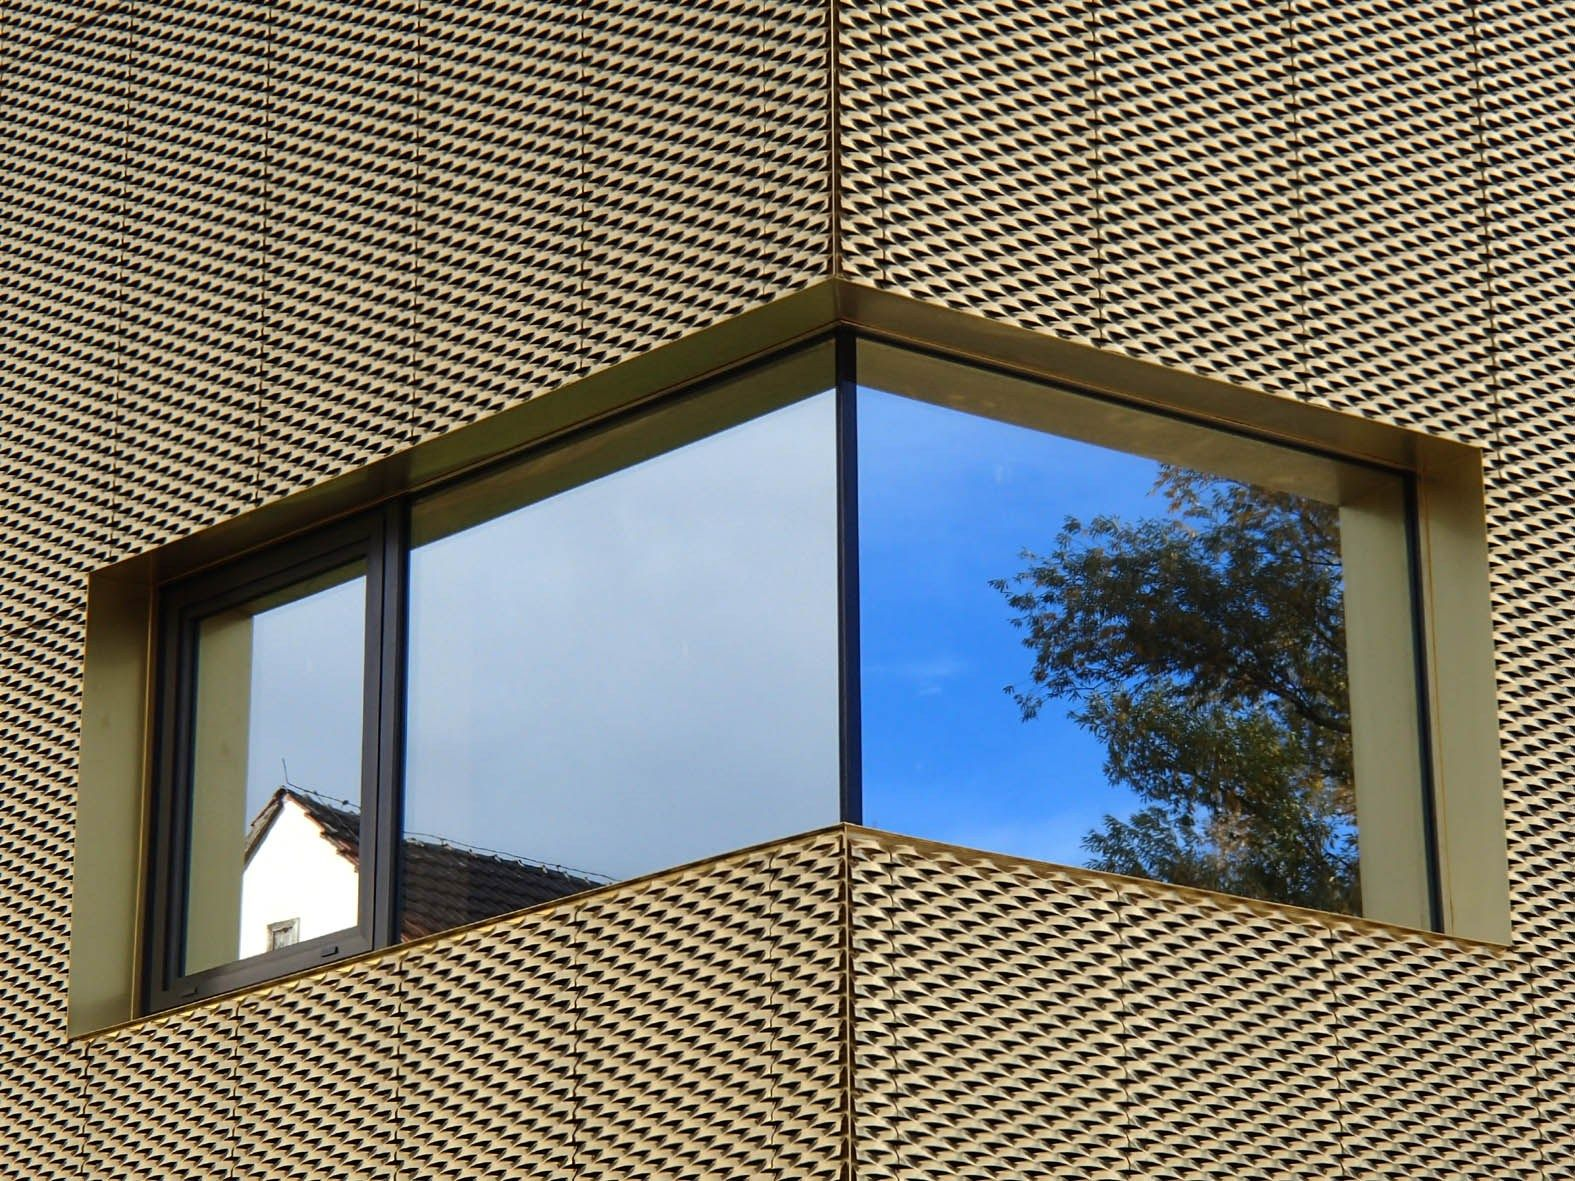 streckmetall f r fassadenverkleidung tecu design mesh by. Black Bedroom Furniture Sets. Home Design Ideas